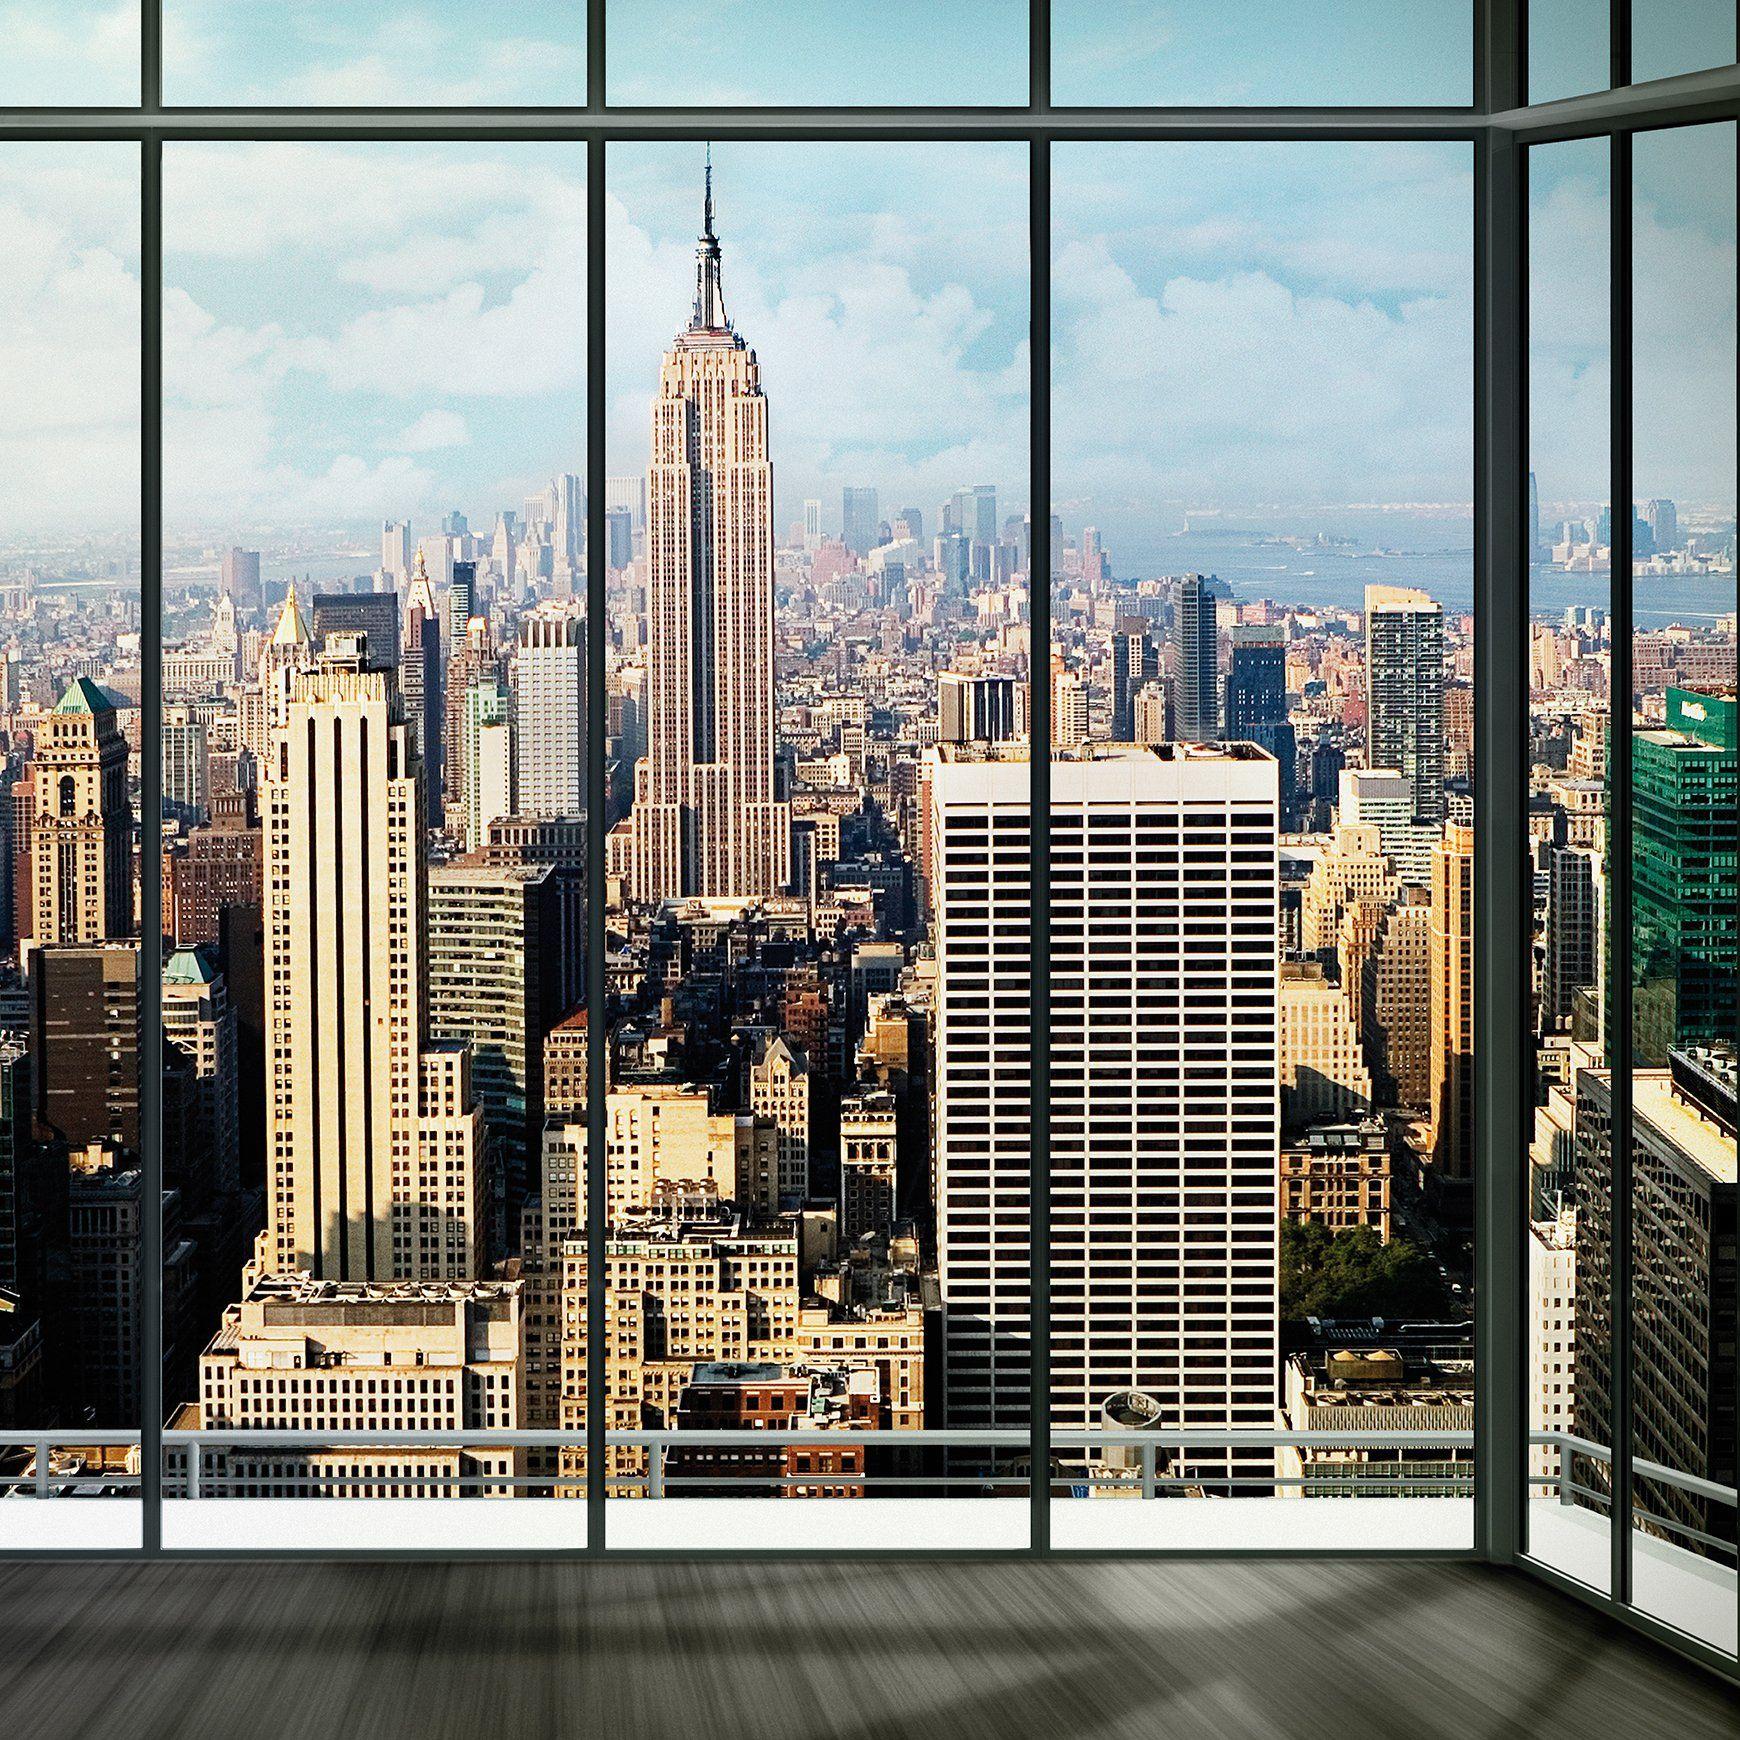 New York Skyline Window Mural | Places | Pinterest ...